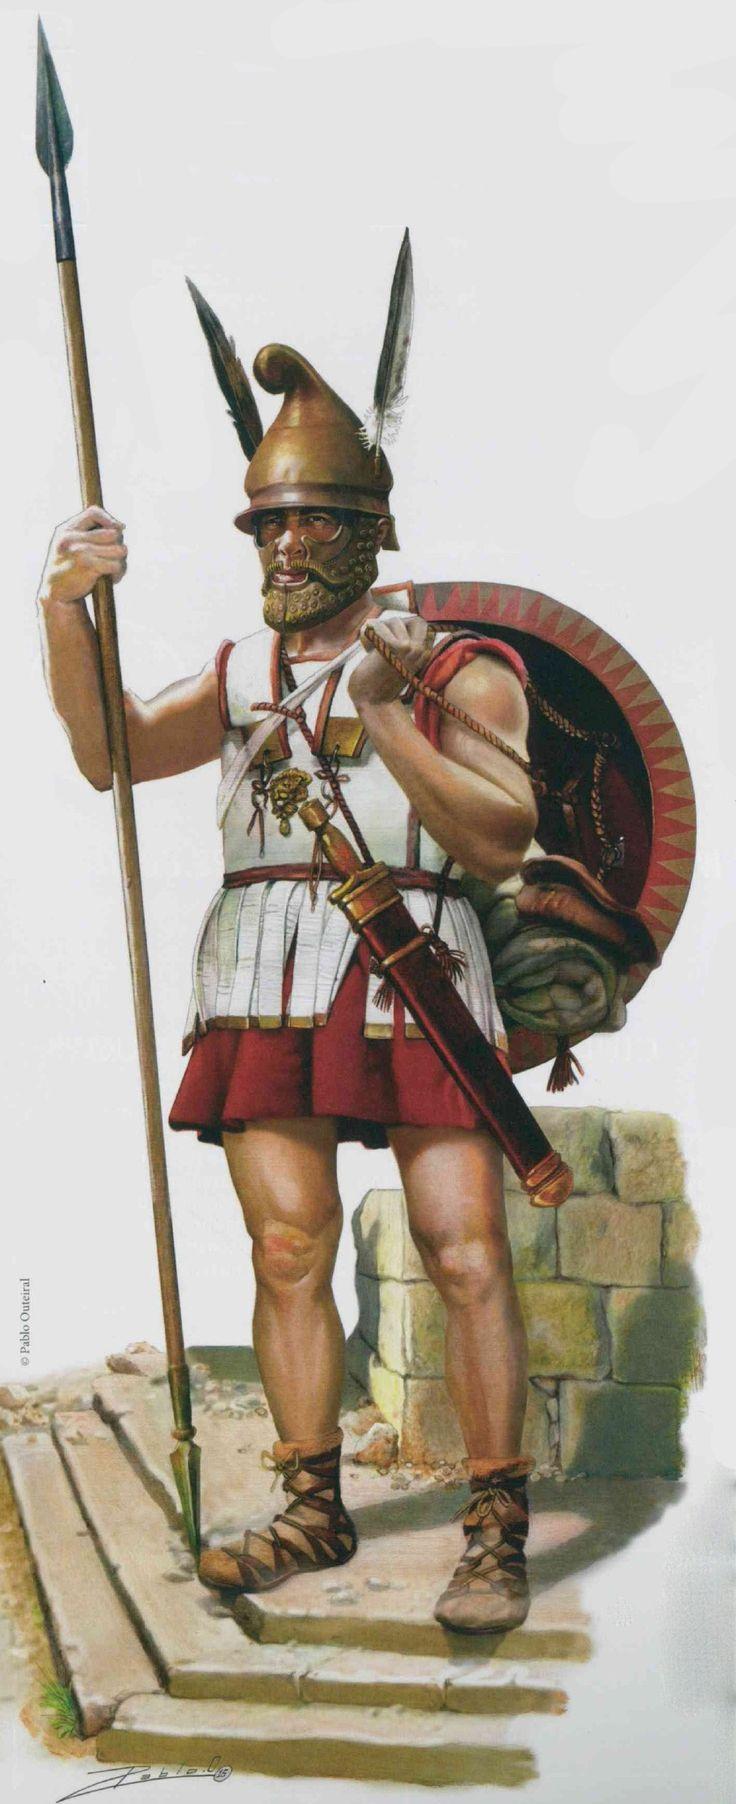 автомобиле воин македонии картинки кандиру начинает поиск